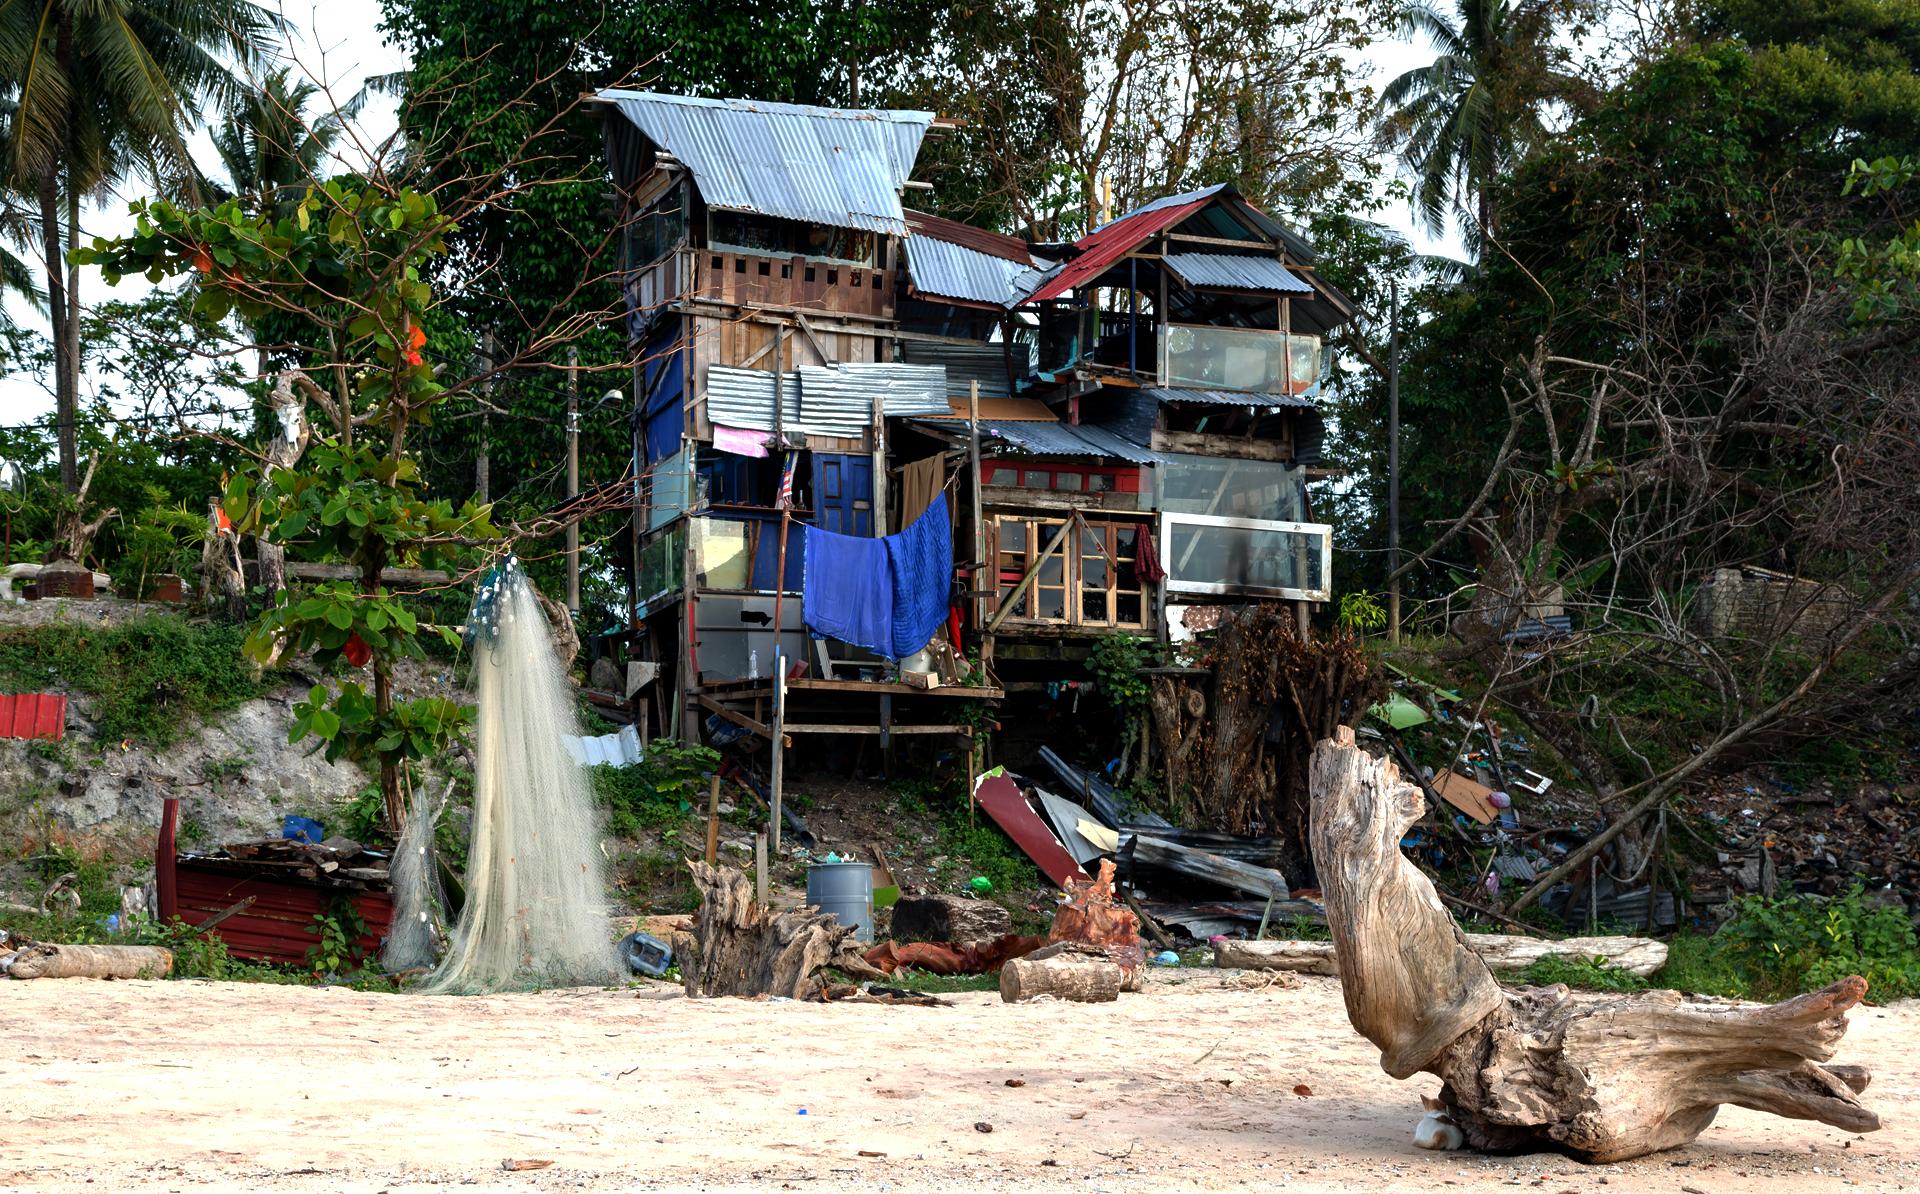 Рыбацкий домик на пляже Pantai Pasir Hitam